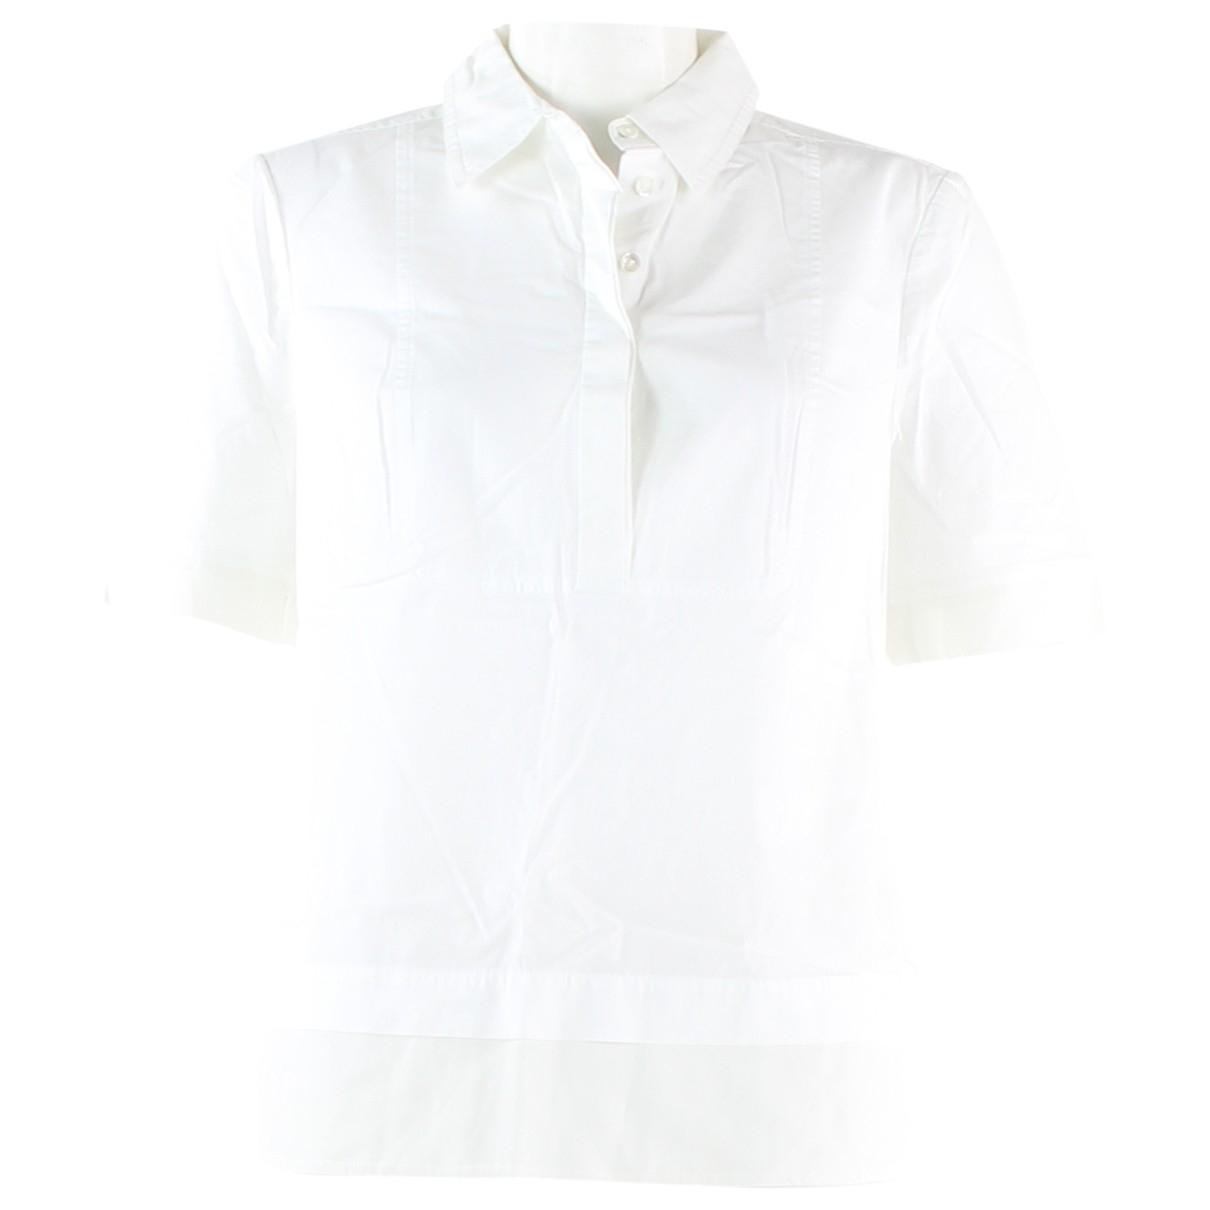 Camisas Tory Burch